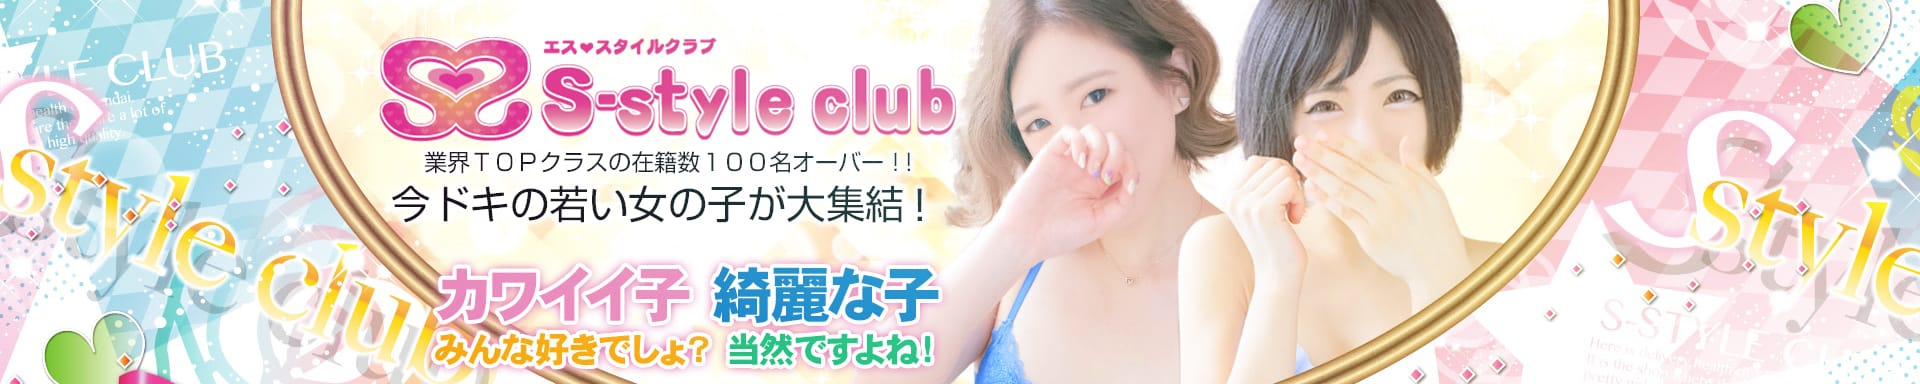 S-style club(エススタイルクラブ) その2